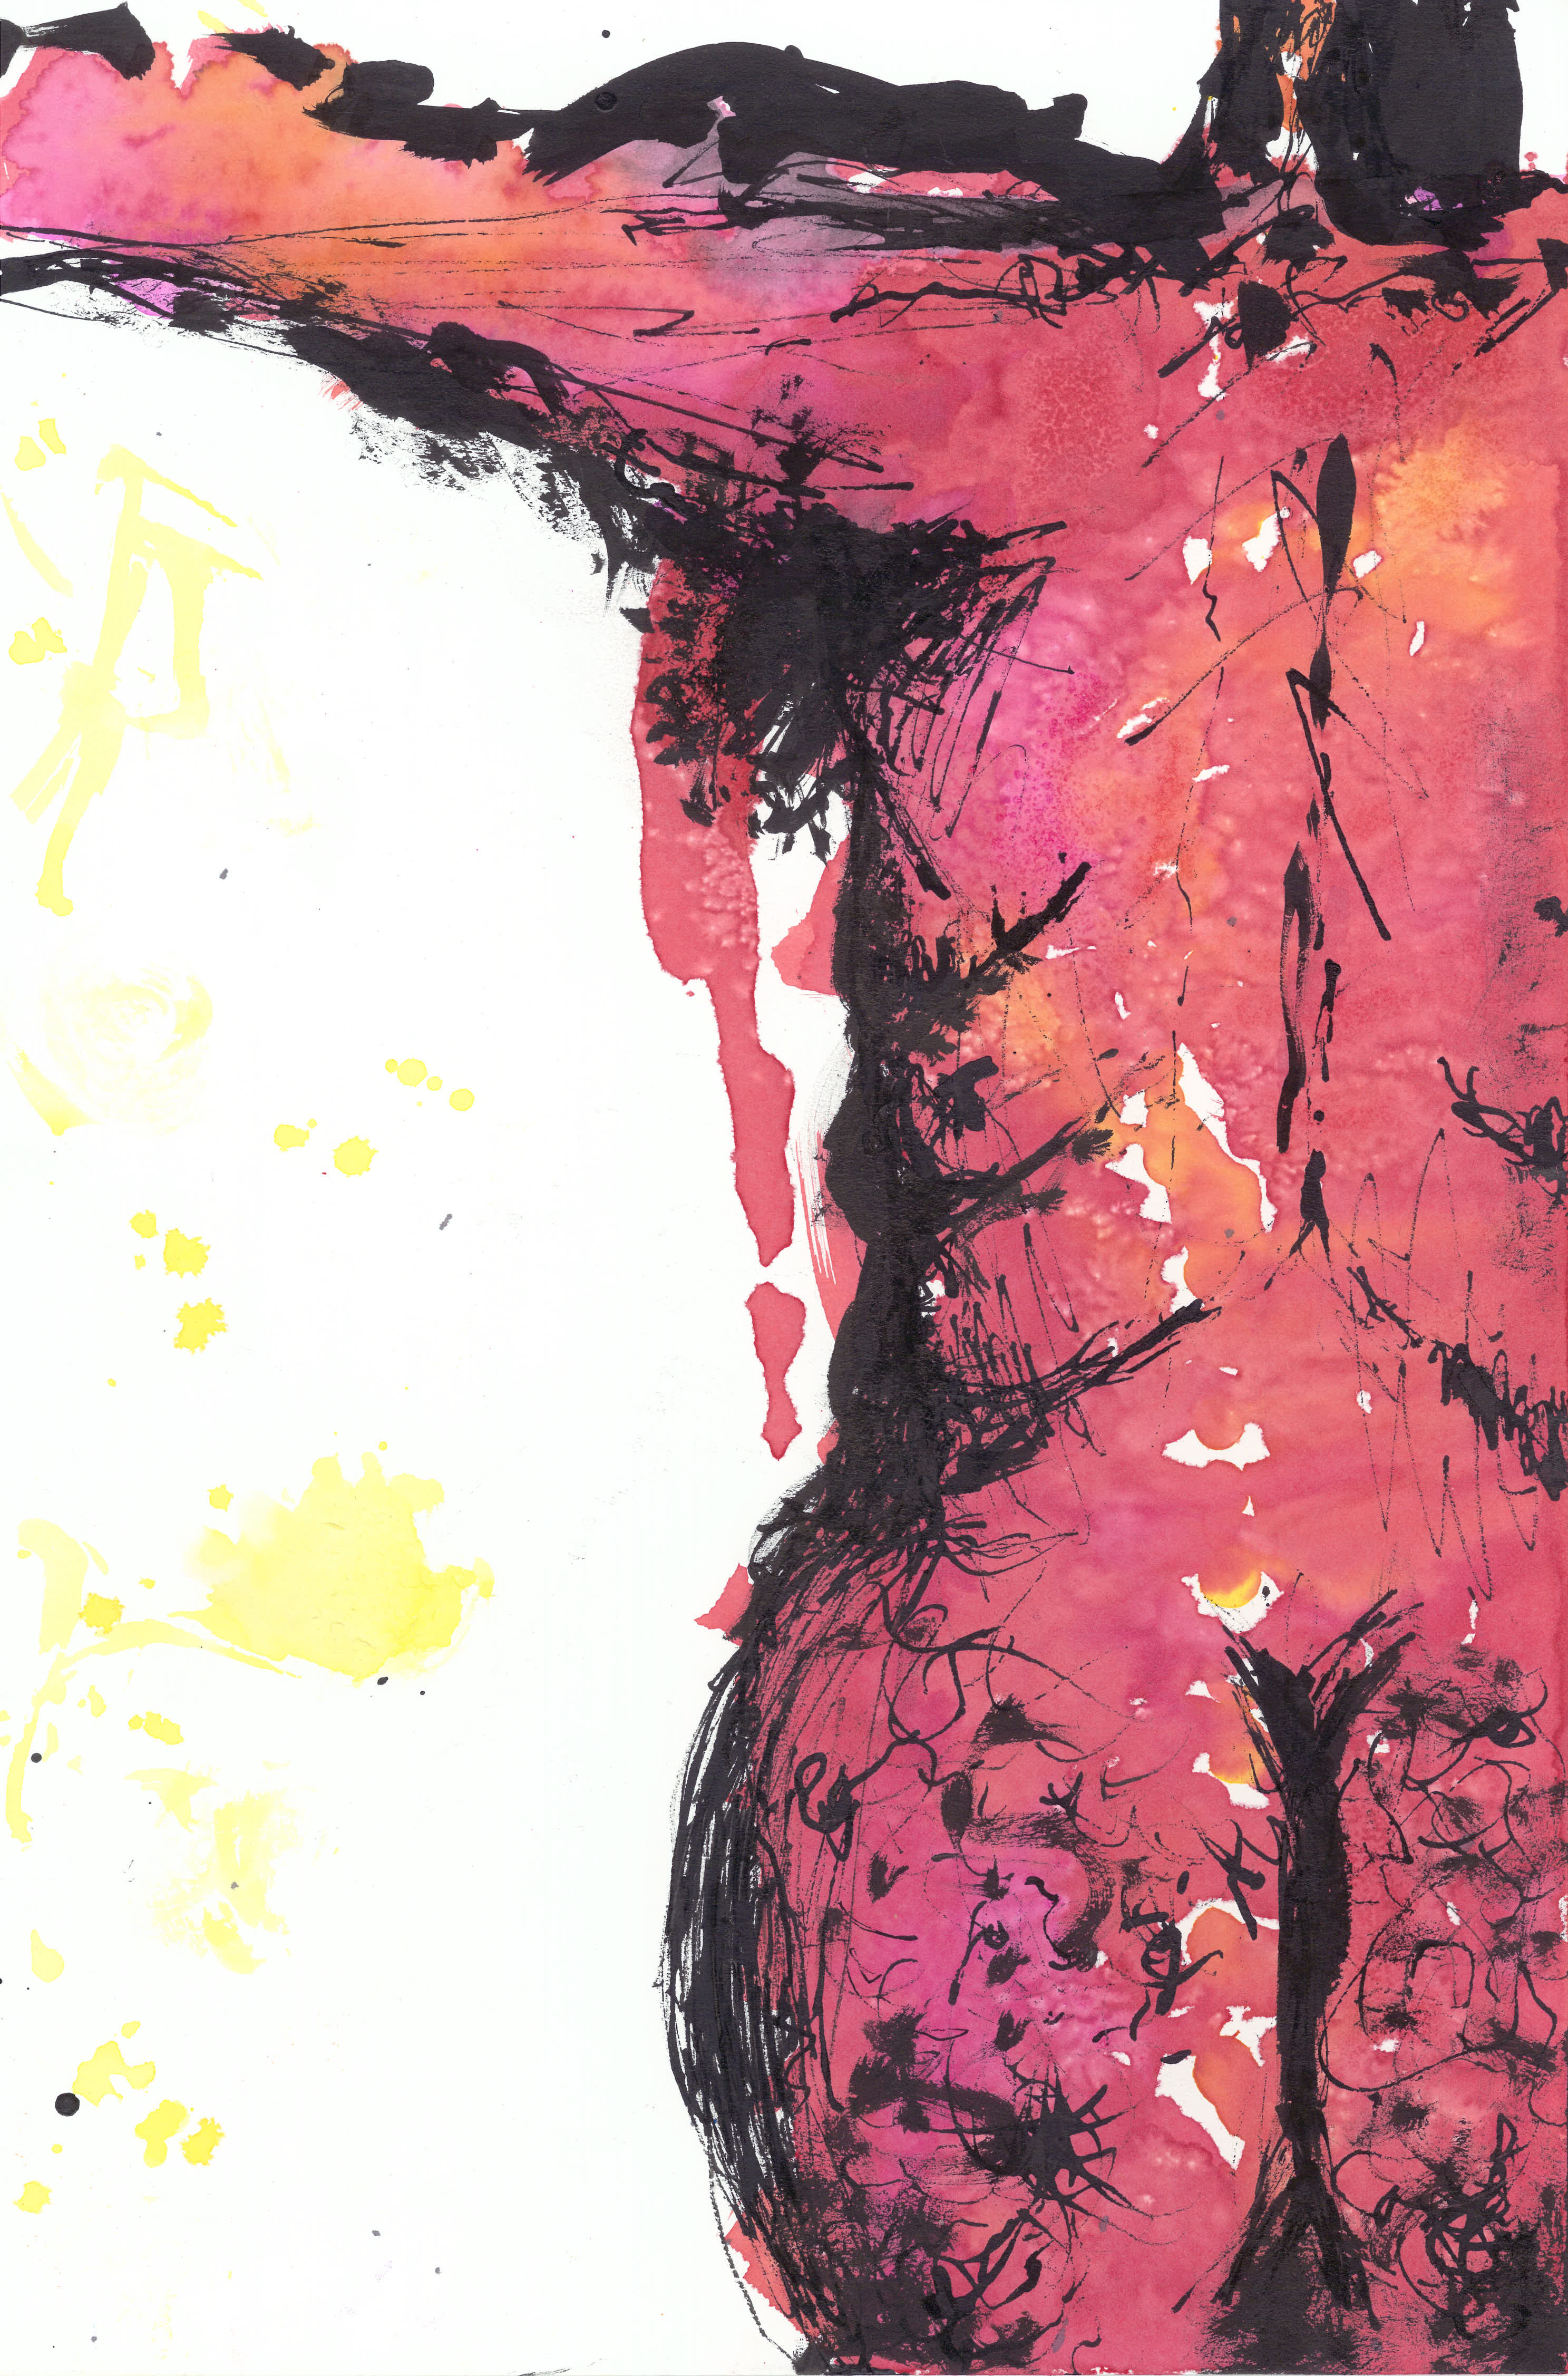 Untitled 3. Watercolor, salt, ink.